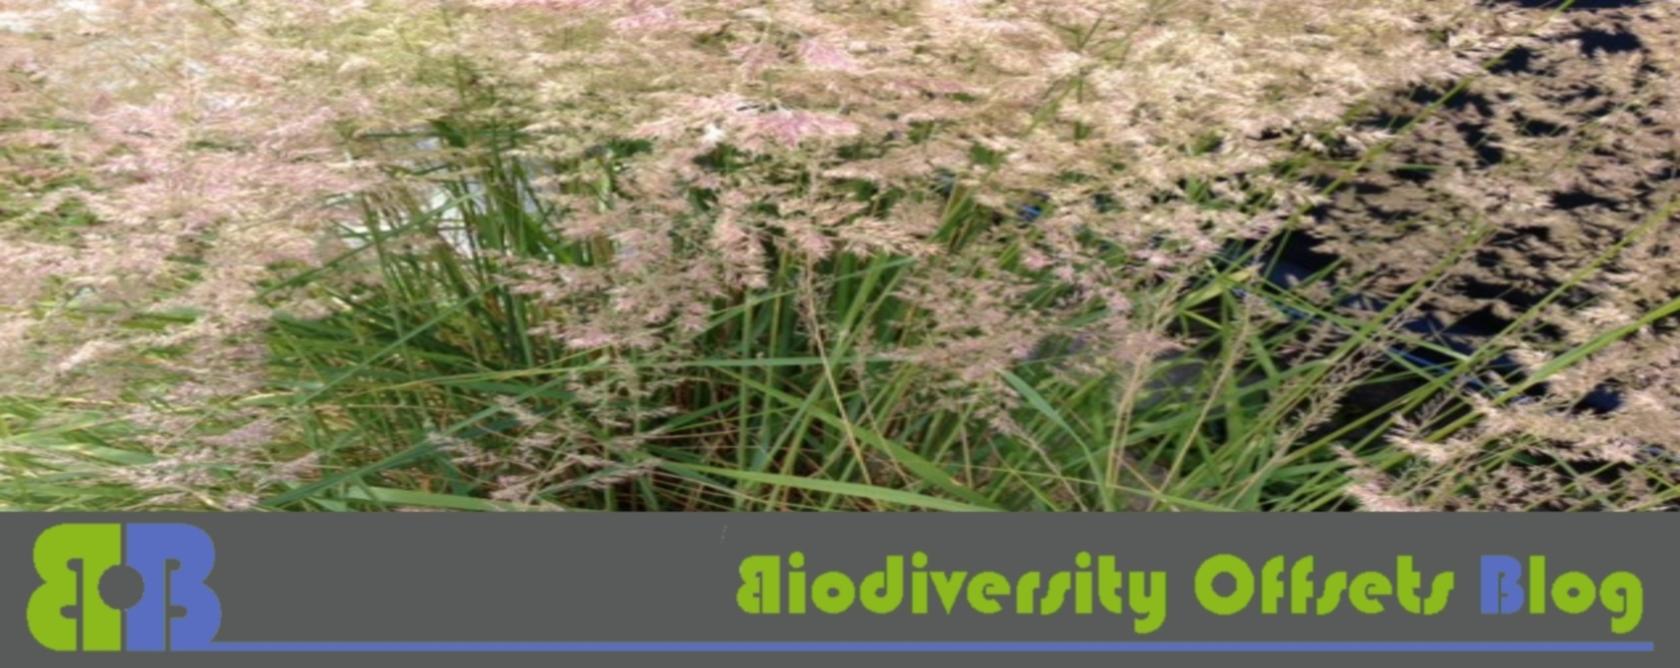 Biodiversity Offsets Blog Logo_hellgruen_Gräser_1680